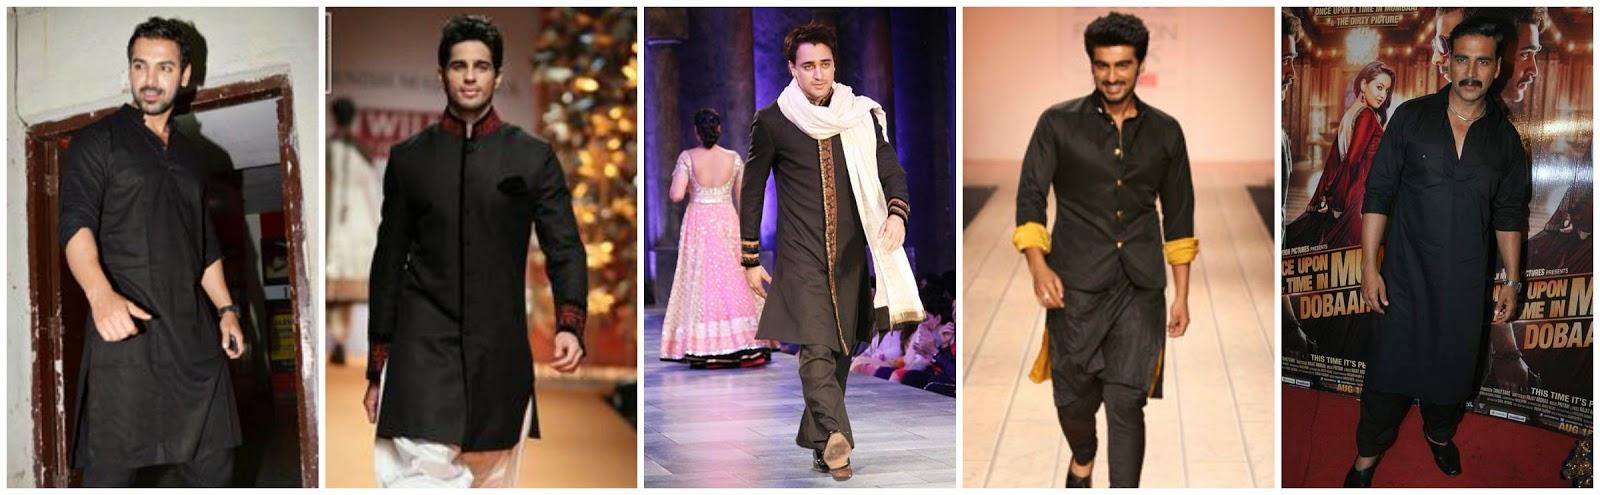 bollywood actor in pathani, pathani, eid 2014 pathani, eid 2014, eid collection